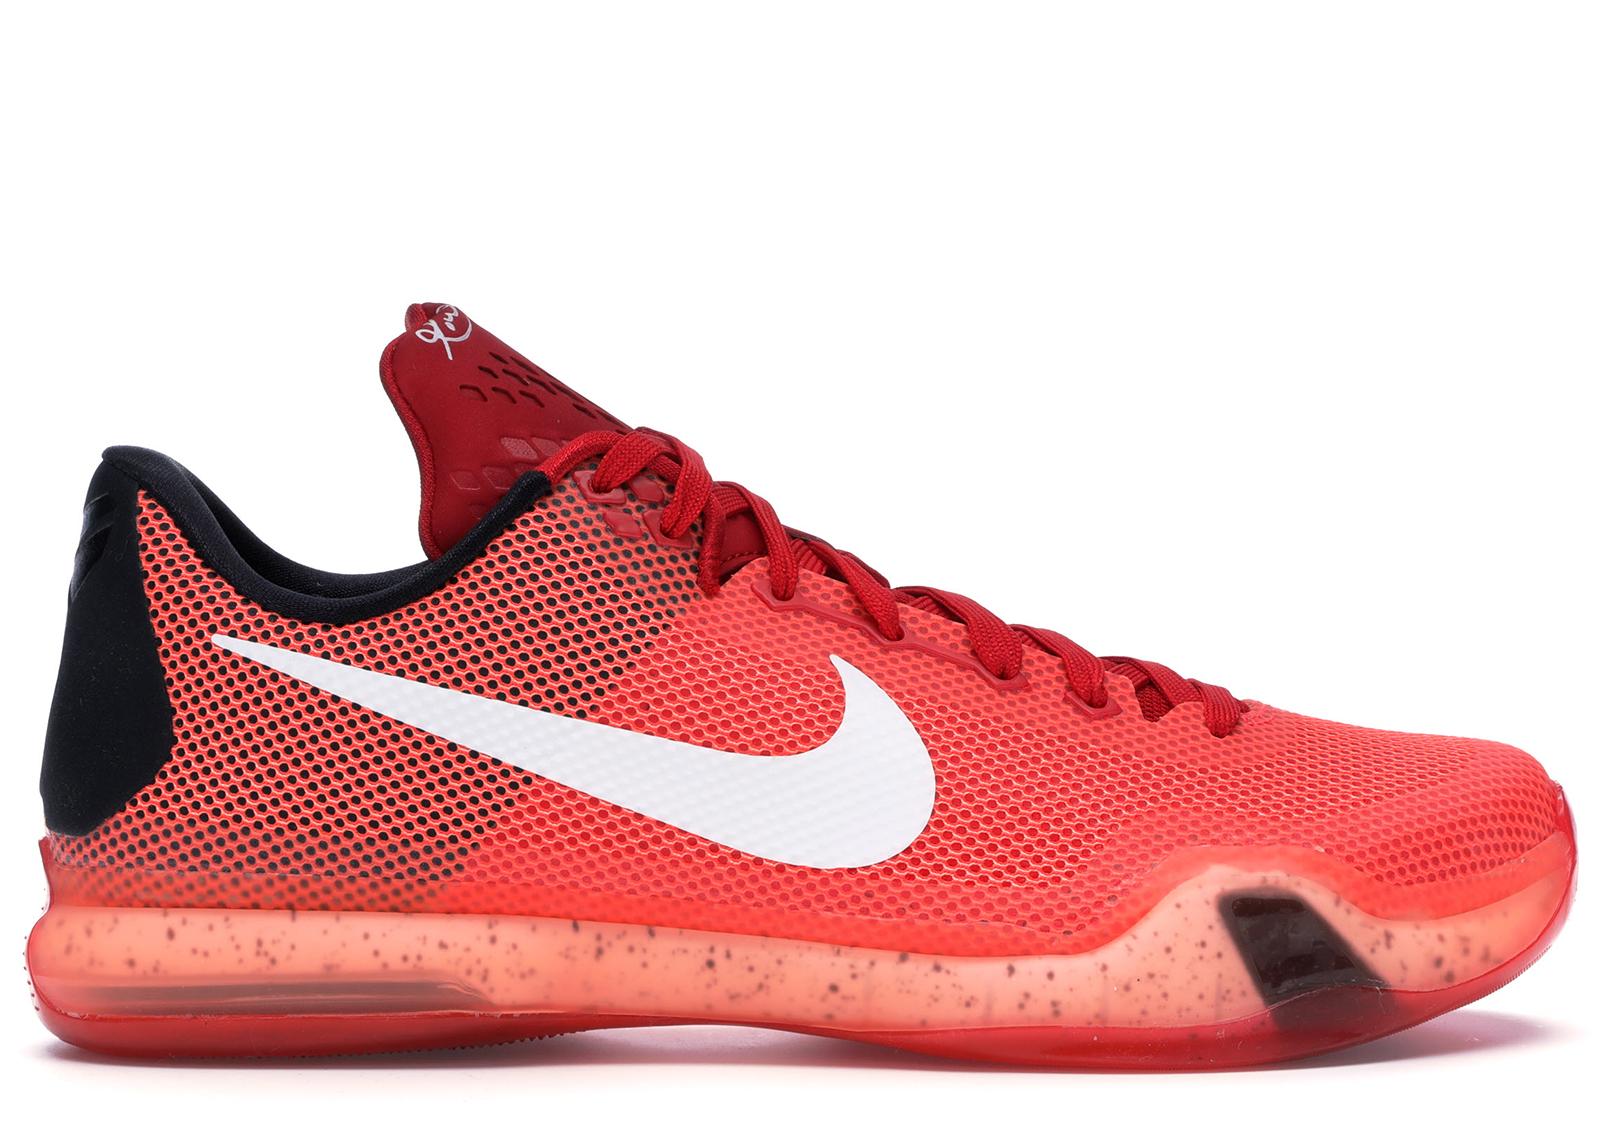 Buy Nike Kobe 10 Shoes & Deadstock Sneakers